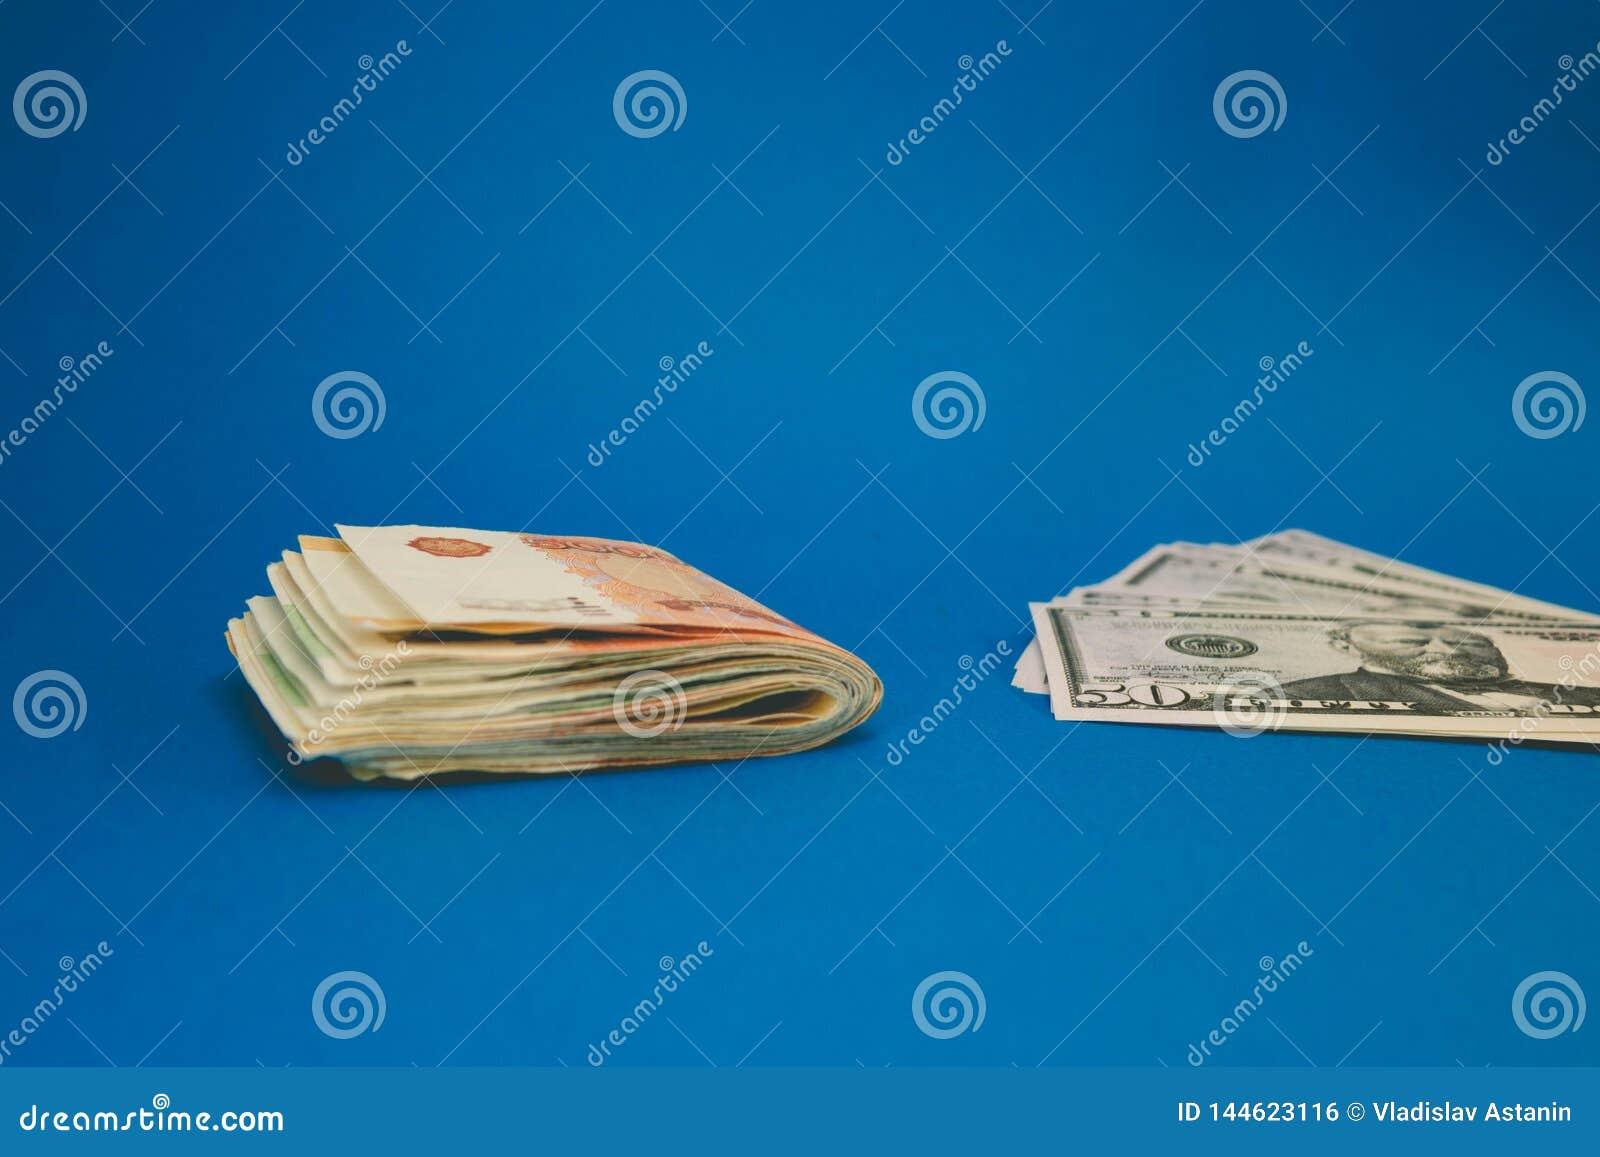 Rublo e d?lar O esfor?o do rublo e do d?lar no mundo financeiro moderno Rela??o da moeda, conceito